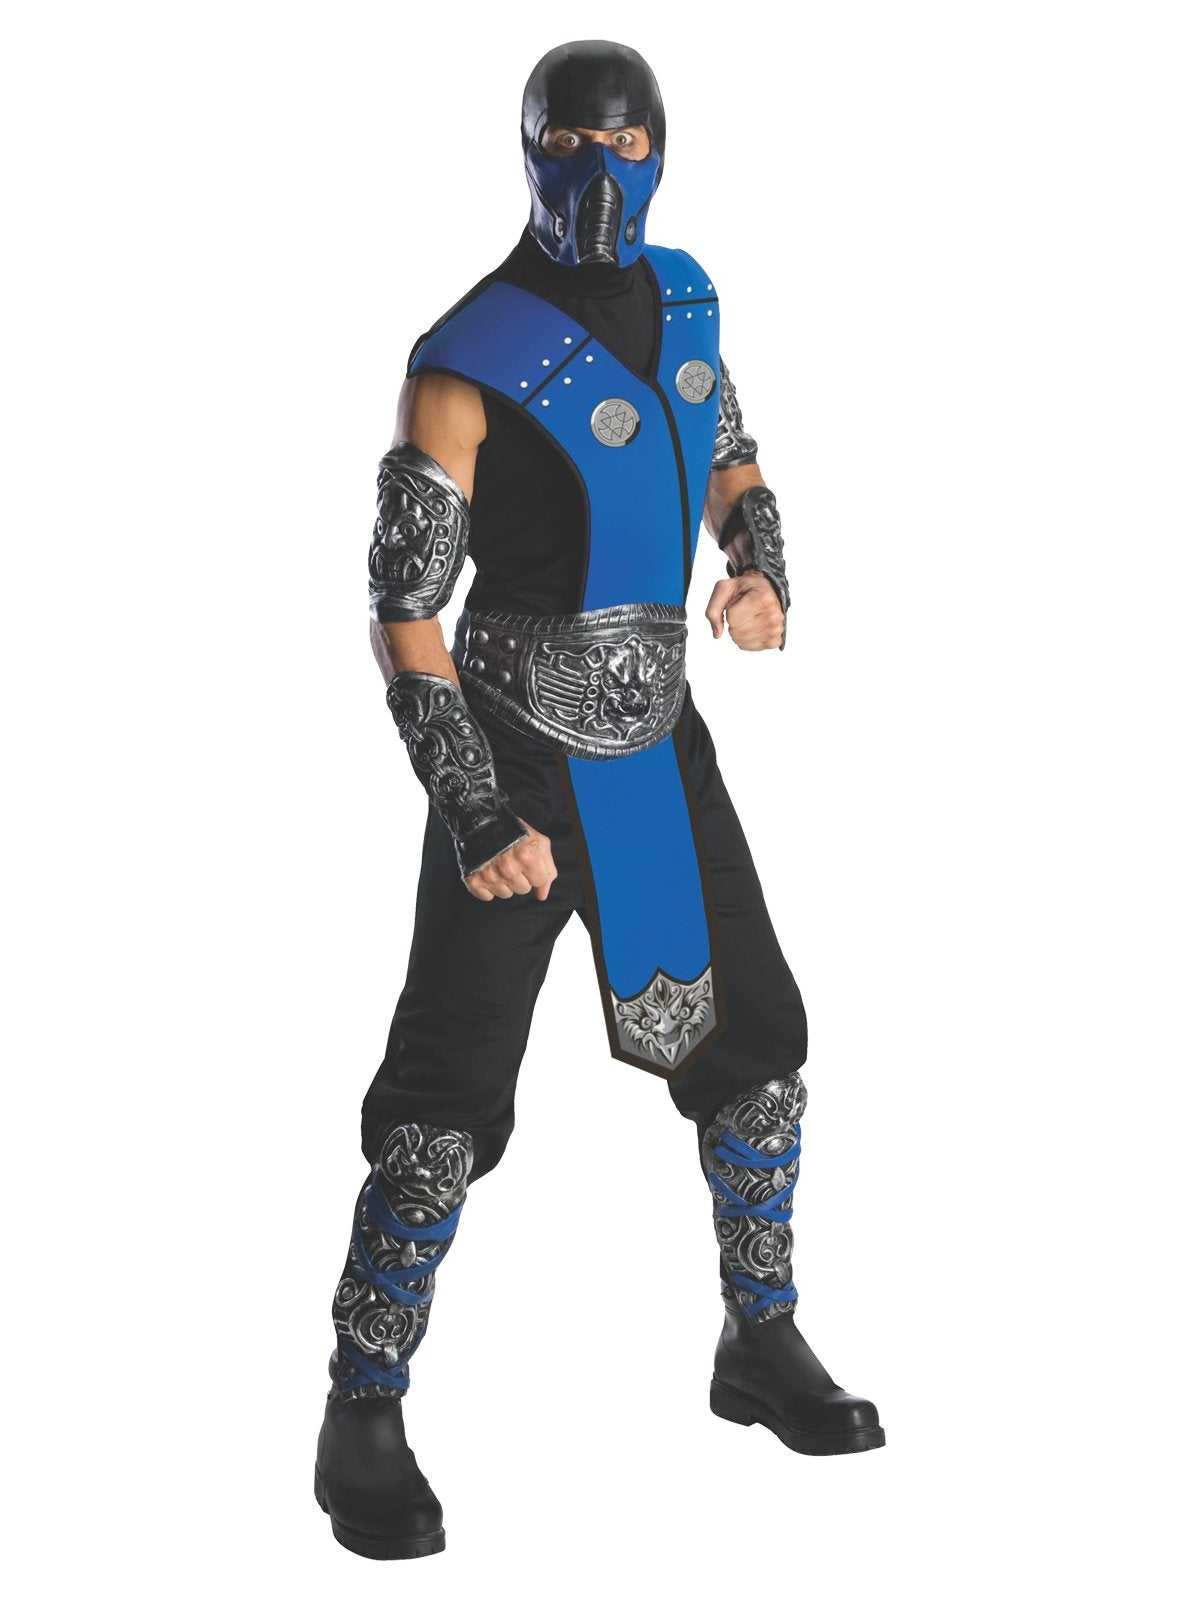 Subzero Costume for Adults - Mortal Kombat